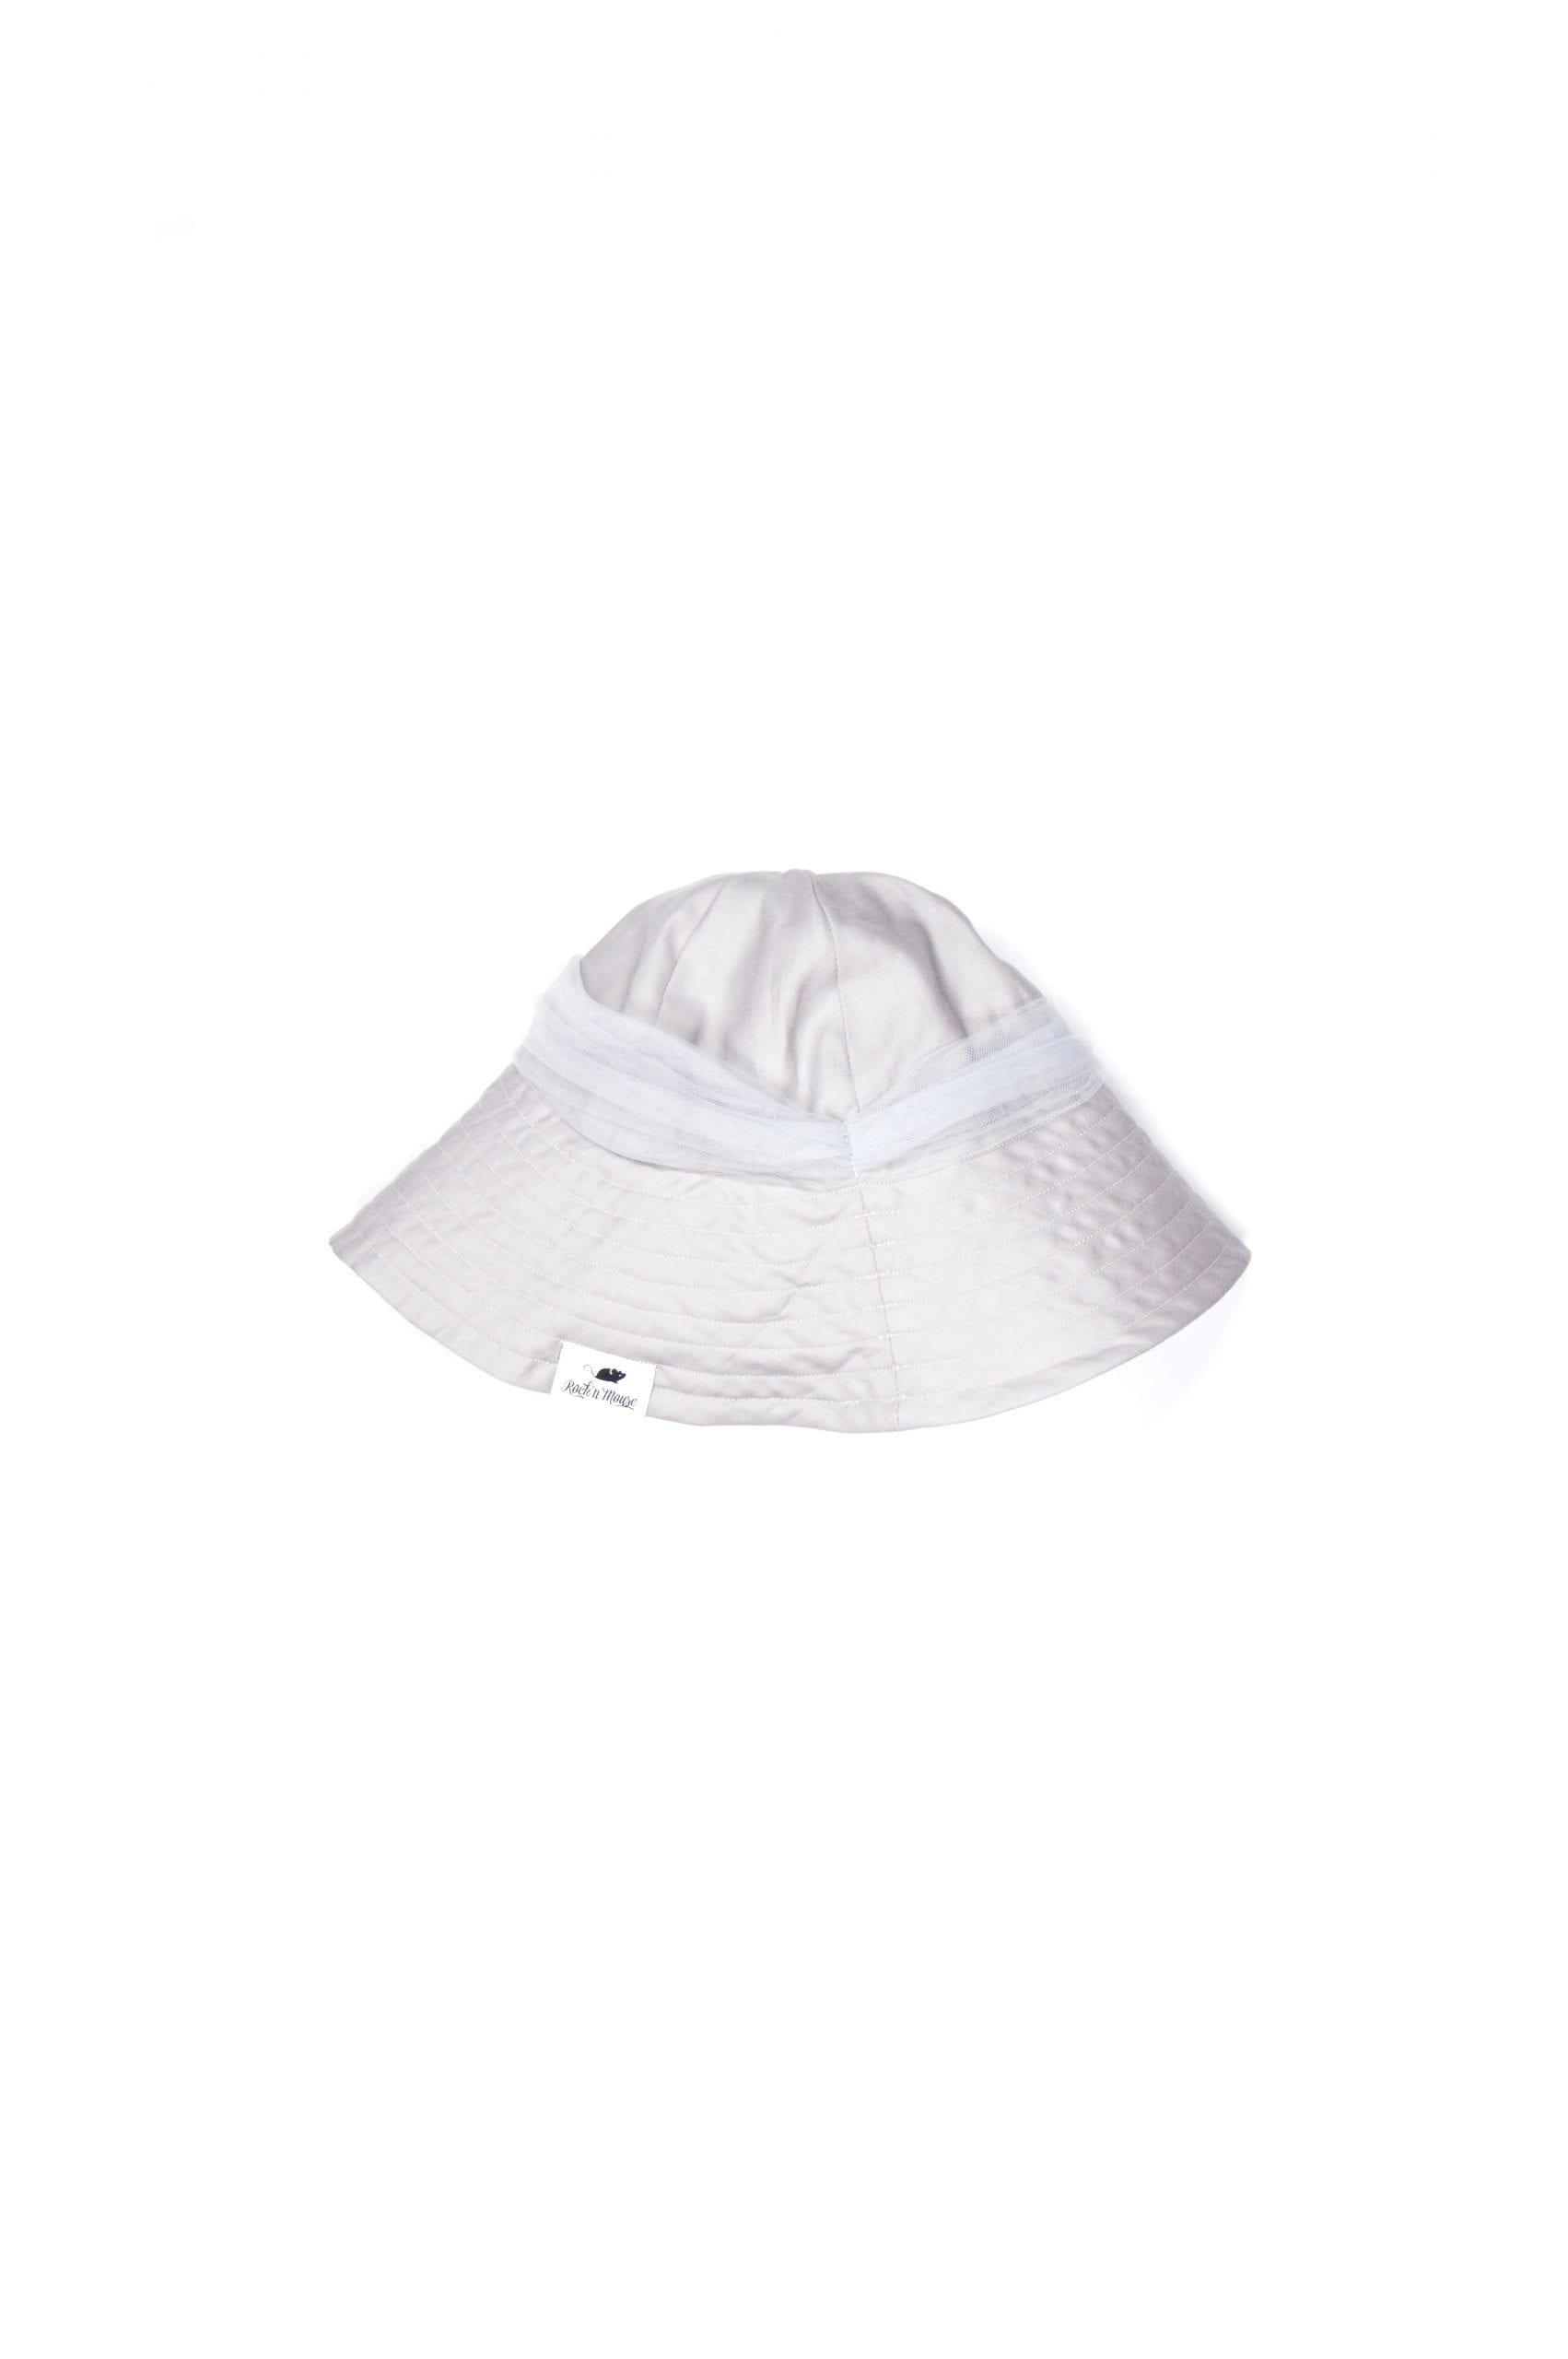 Light grey floppy summer hat with tulle bow for kids, toddler, girls